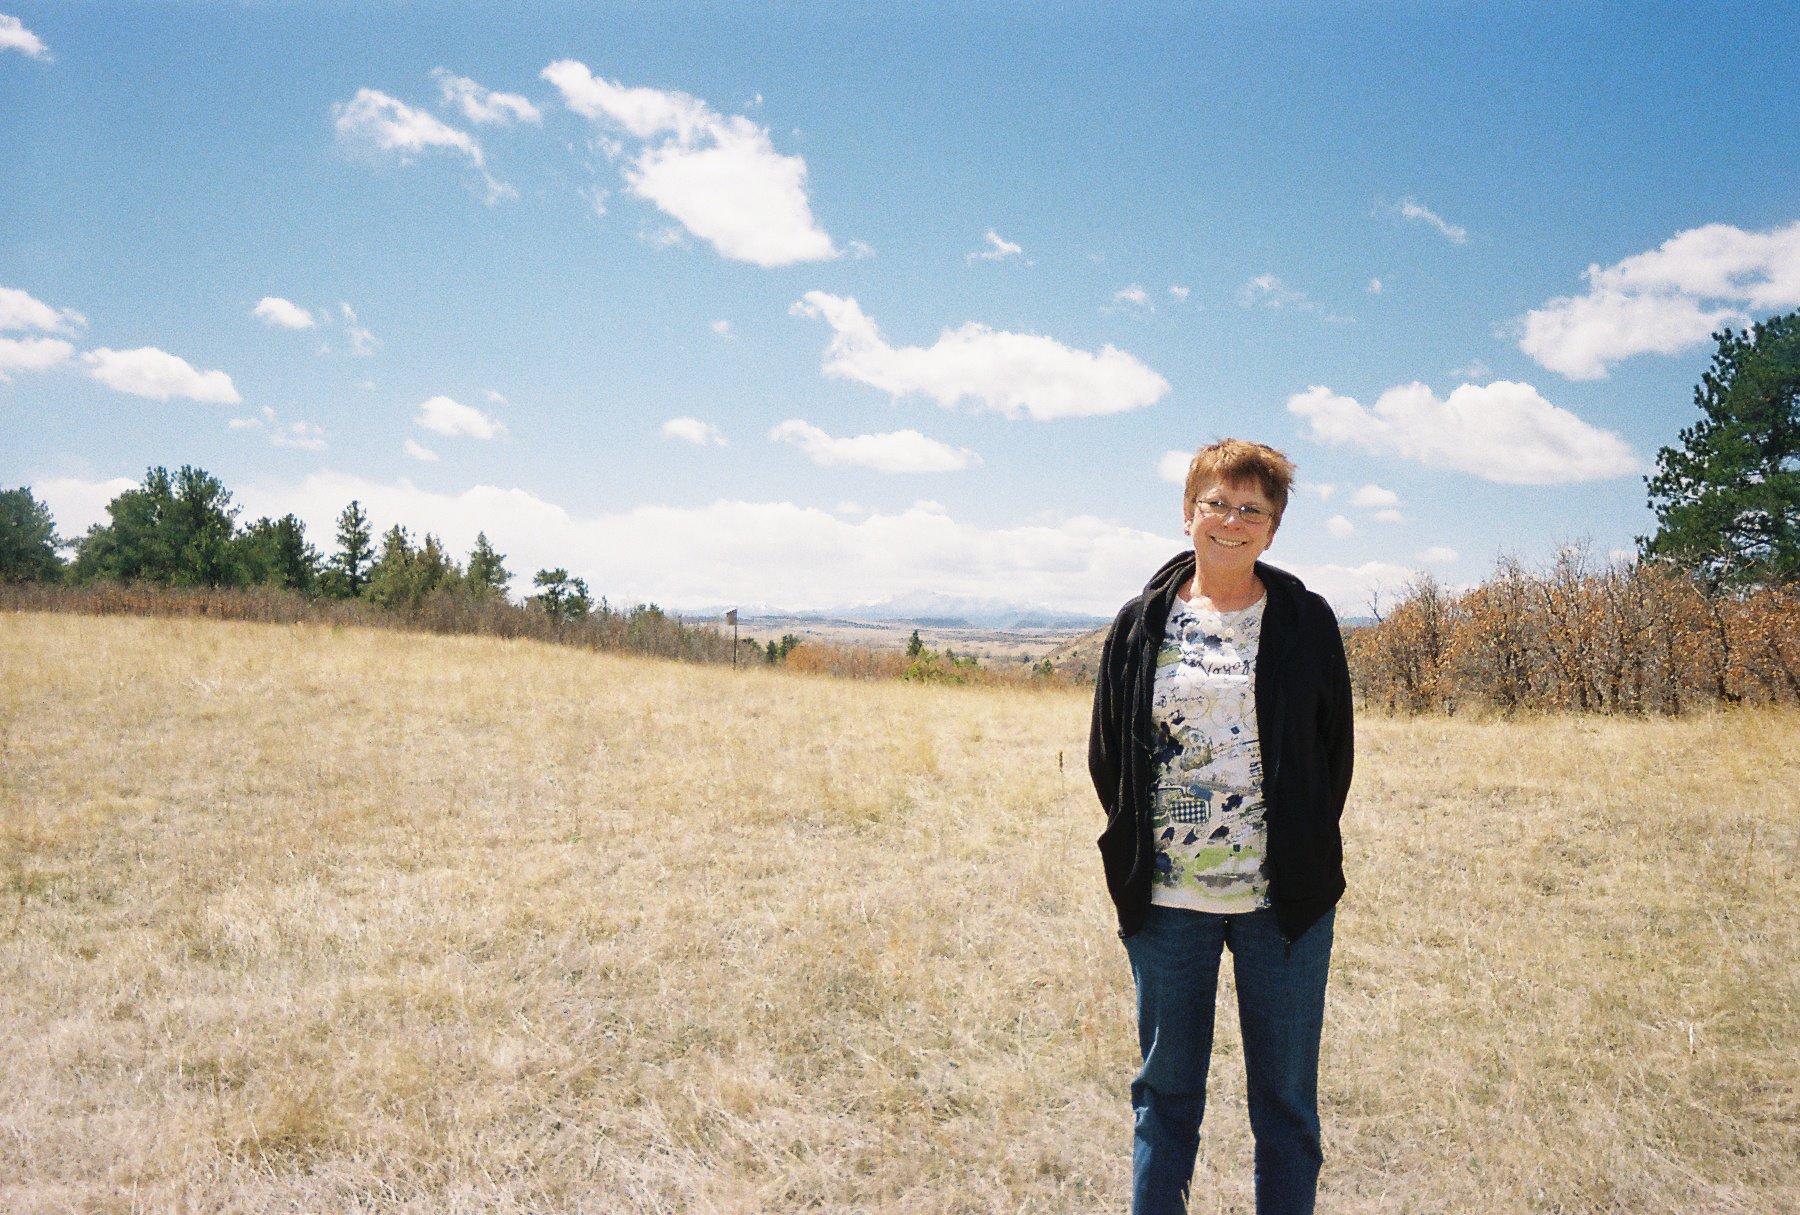 Pat Feldmeier at Castlewood Canyon